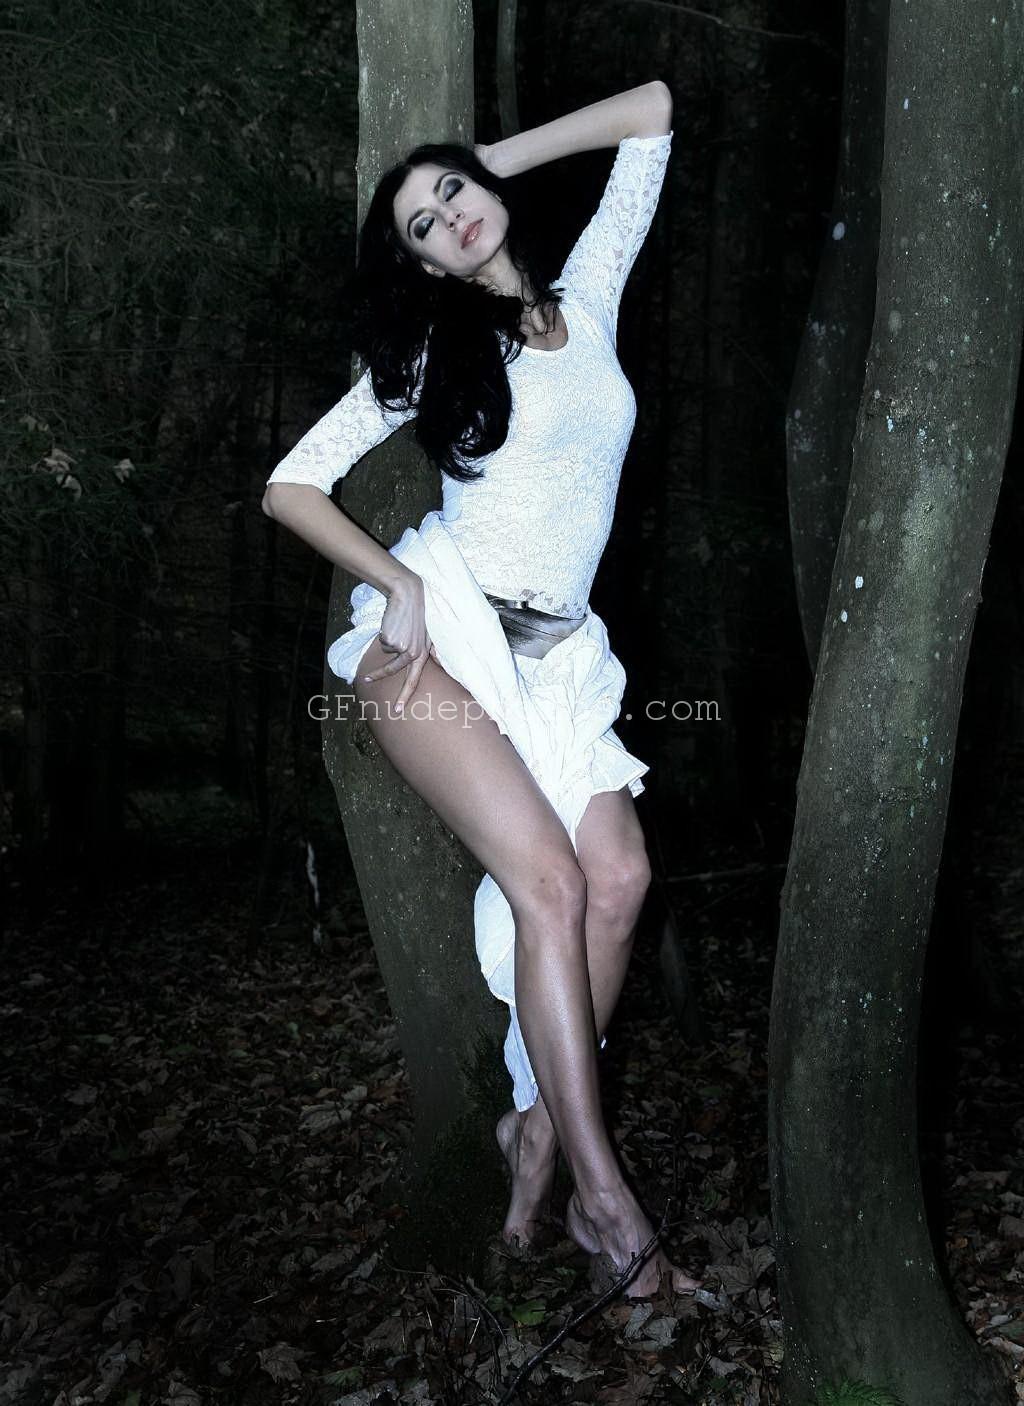 Jennifer aniston in panties wet